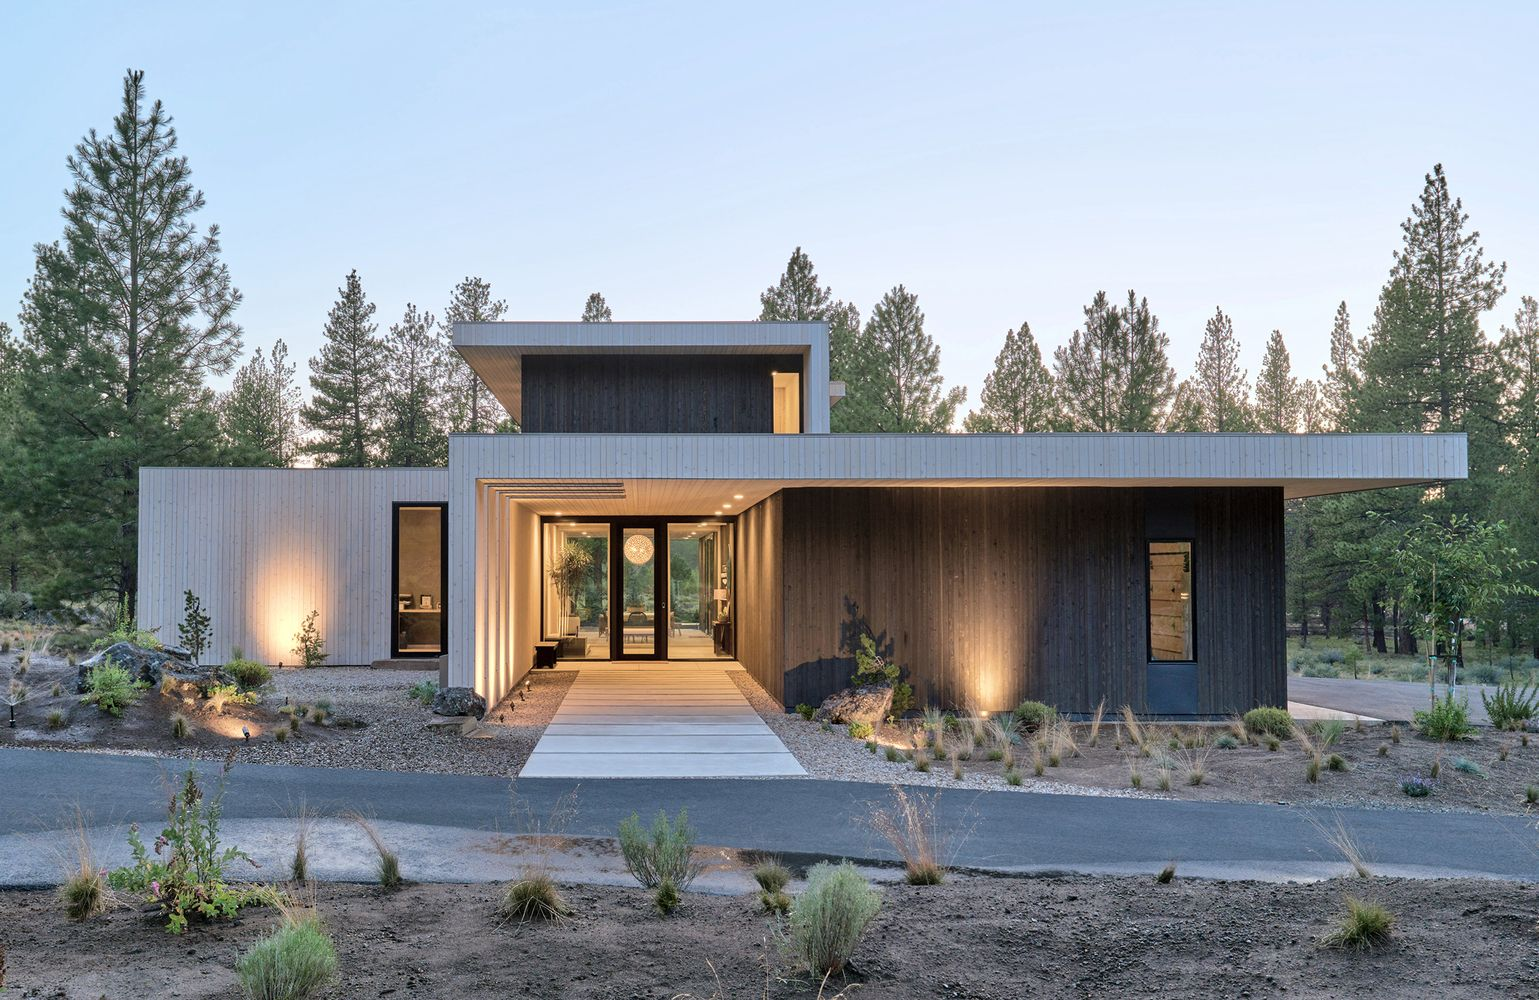 Galeria De Casa Valentine Eric Meglasson Architect Lightfoot A D 1 In 2020 Modern Residential Architecture Architecture Design Architecture